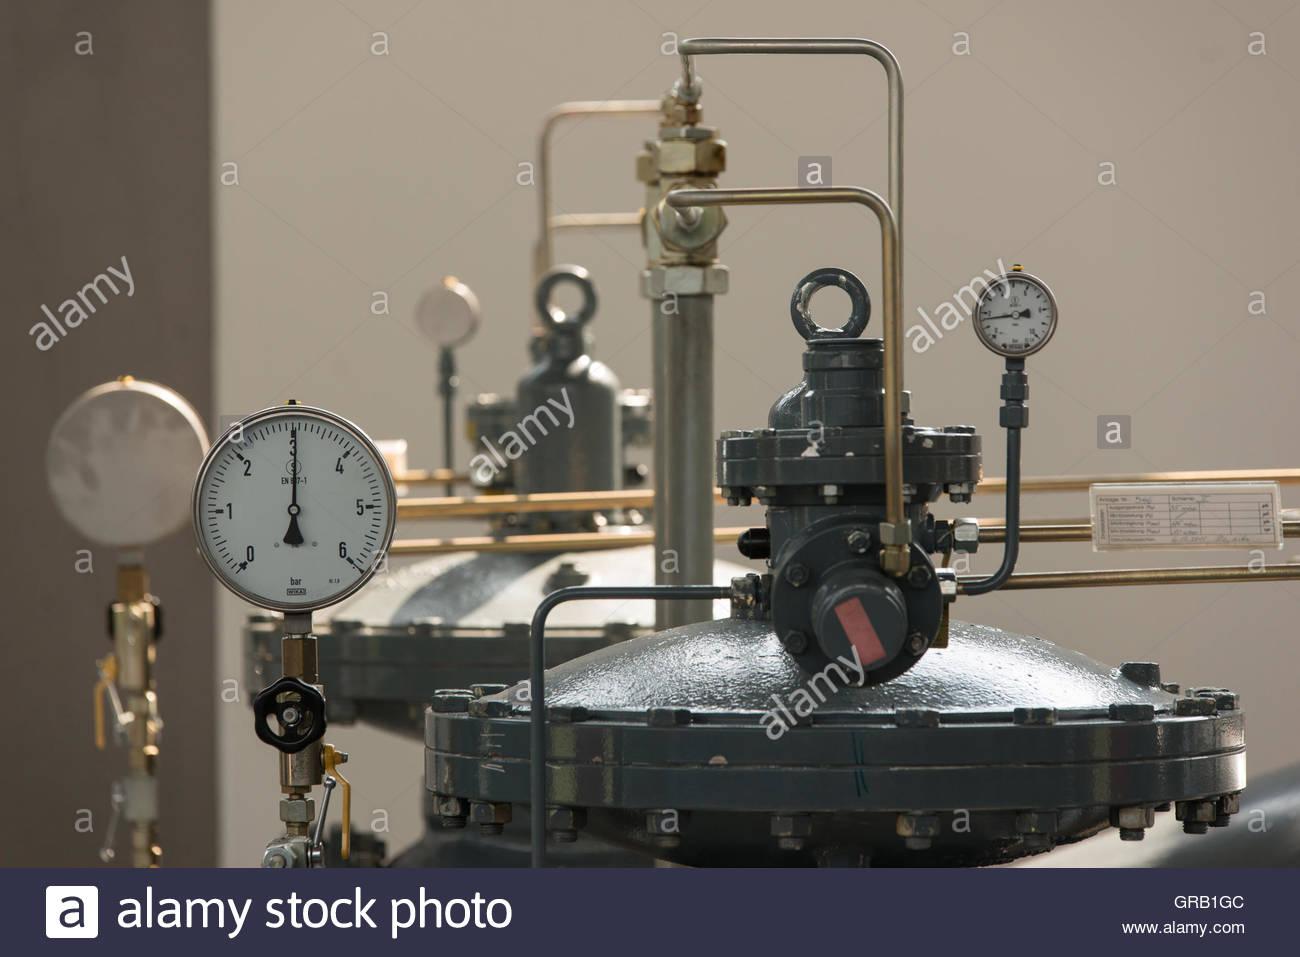 Gas Pressure Regulating Station - Stock Image